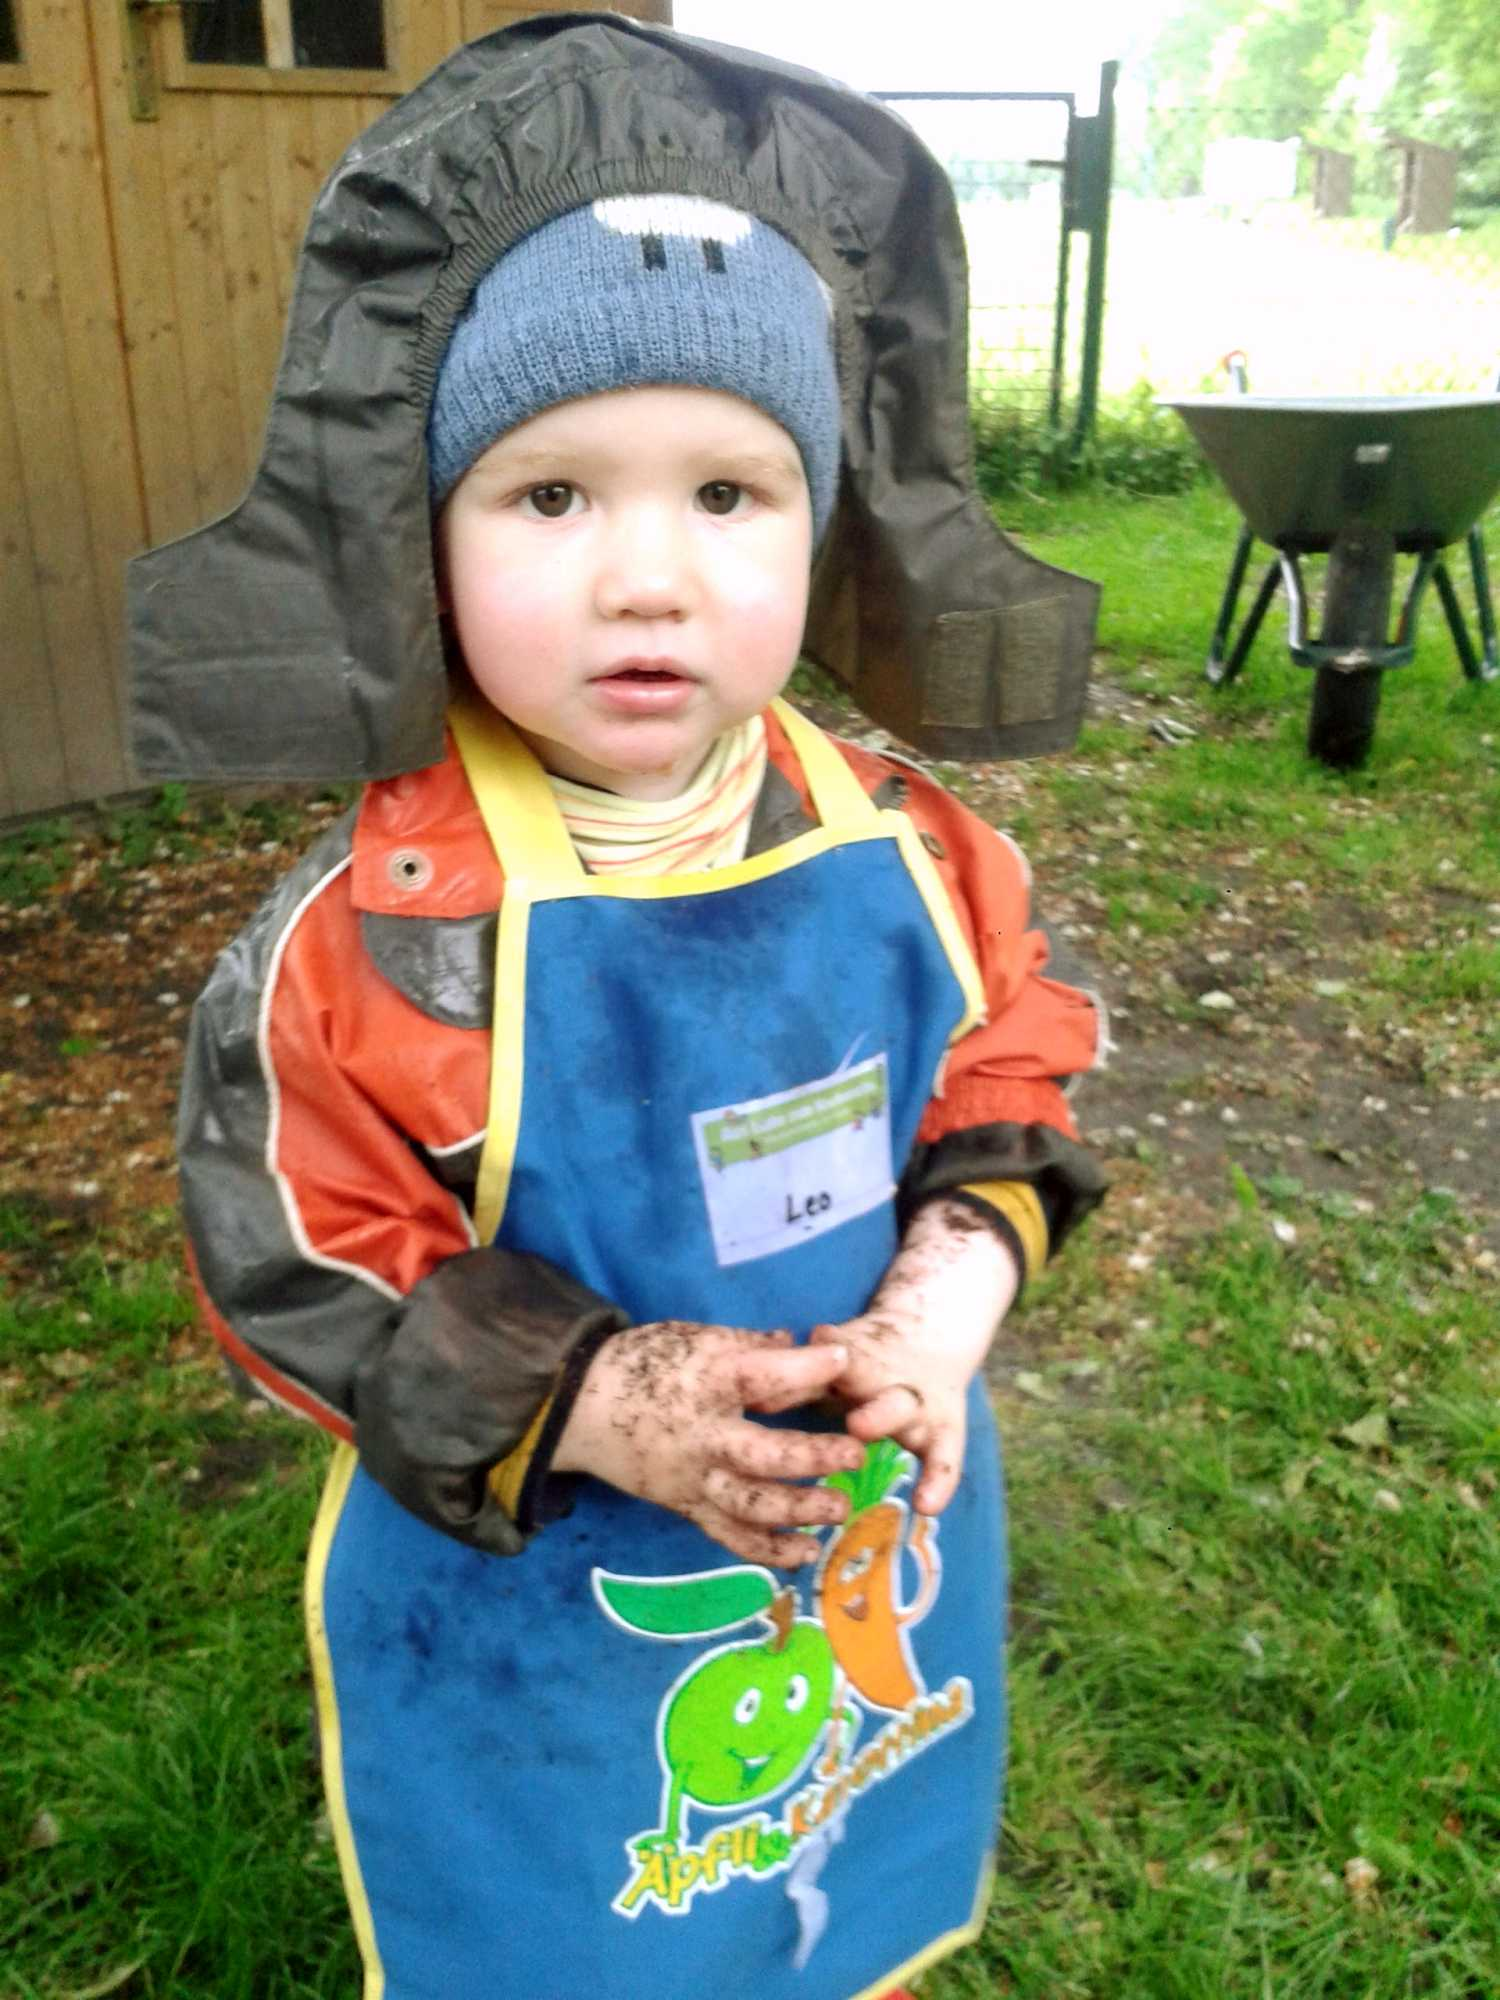 Gemüsebeet Kid Zone Kinderbetreuung 2 - Gemüsebeet für Kinder